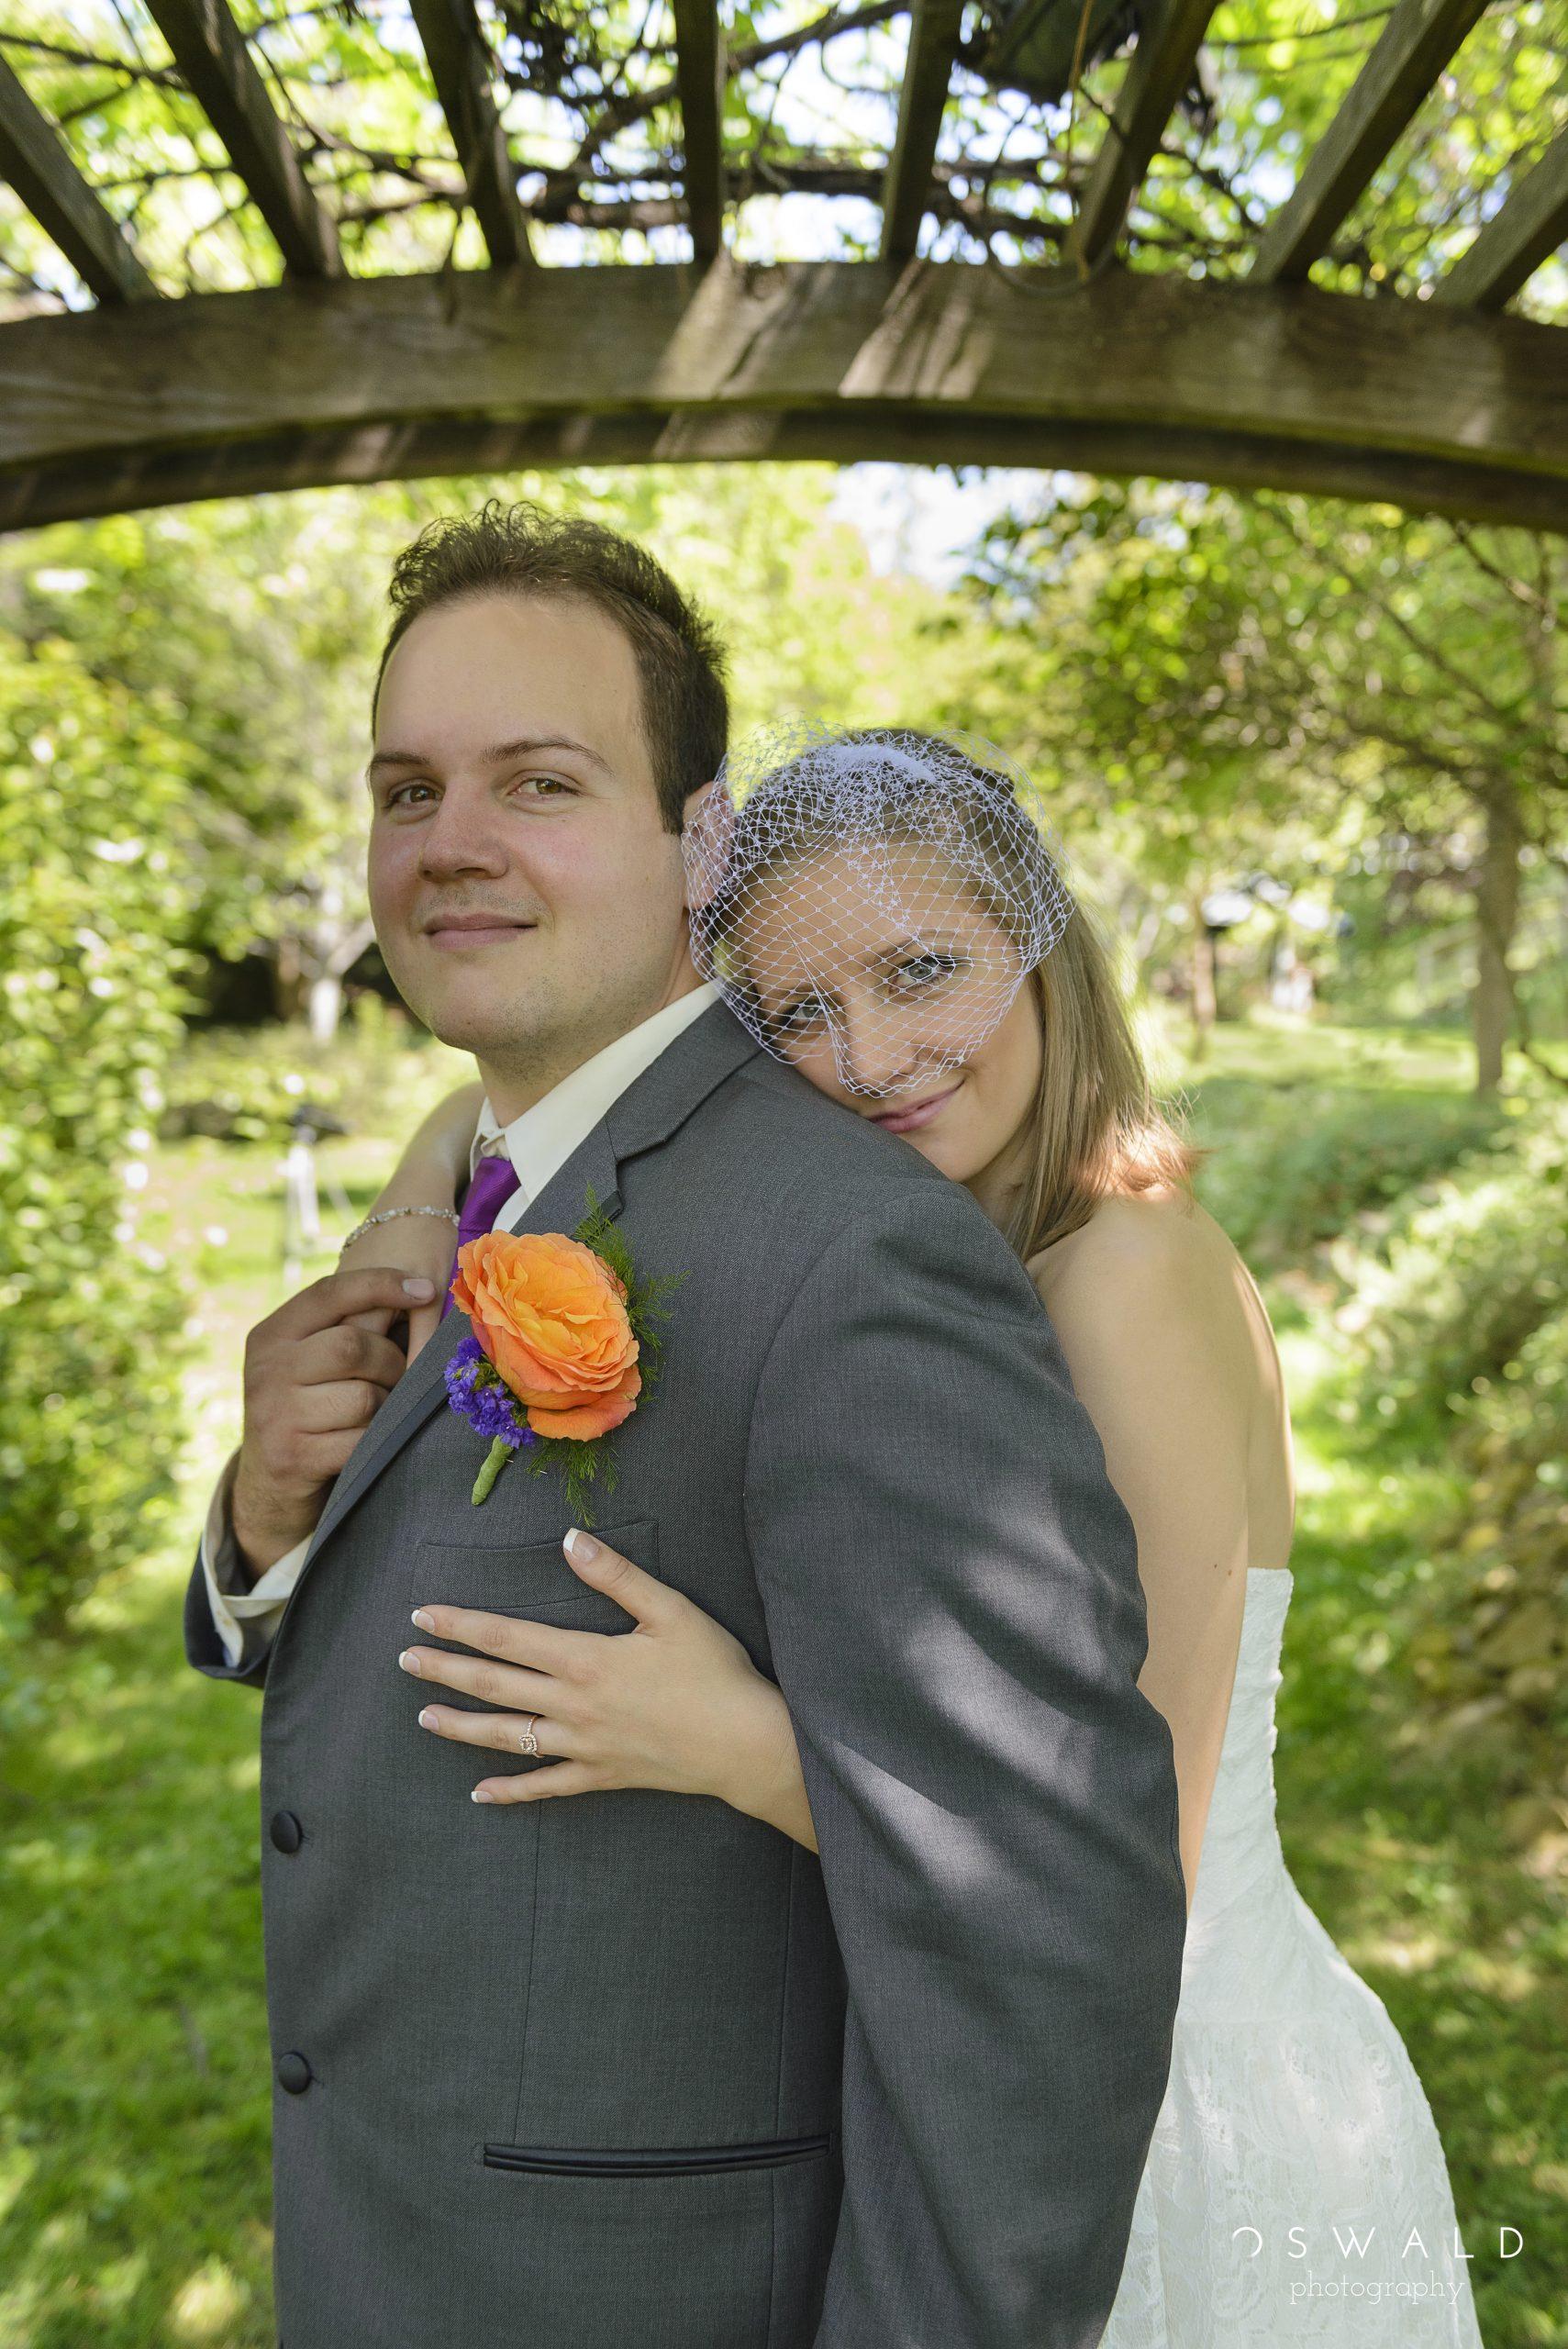 Photograph of groom and his veiled bride underneath a trellis.